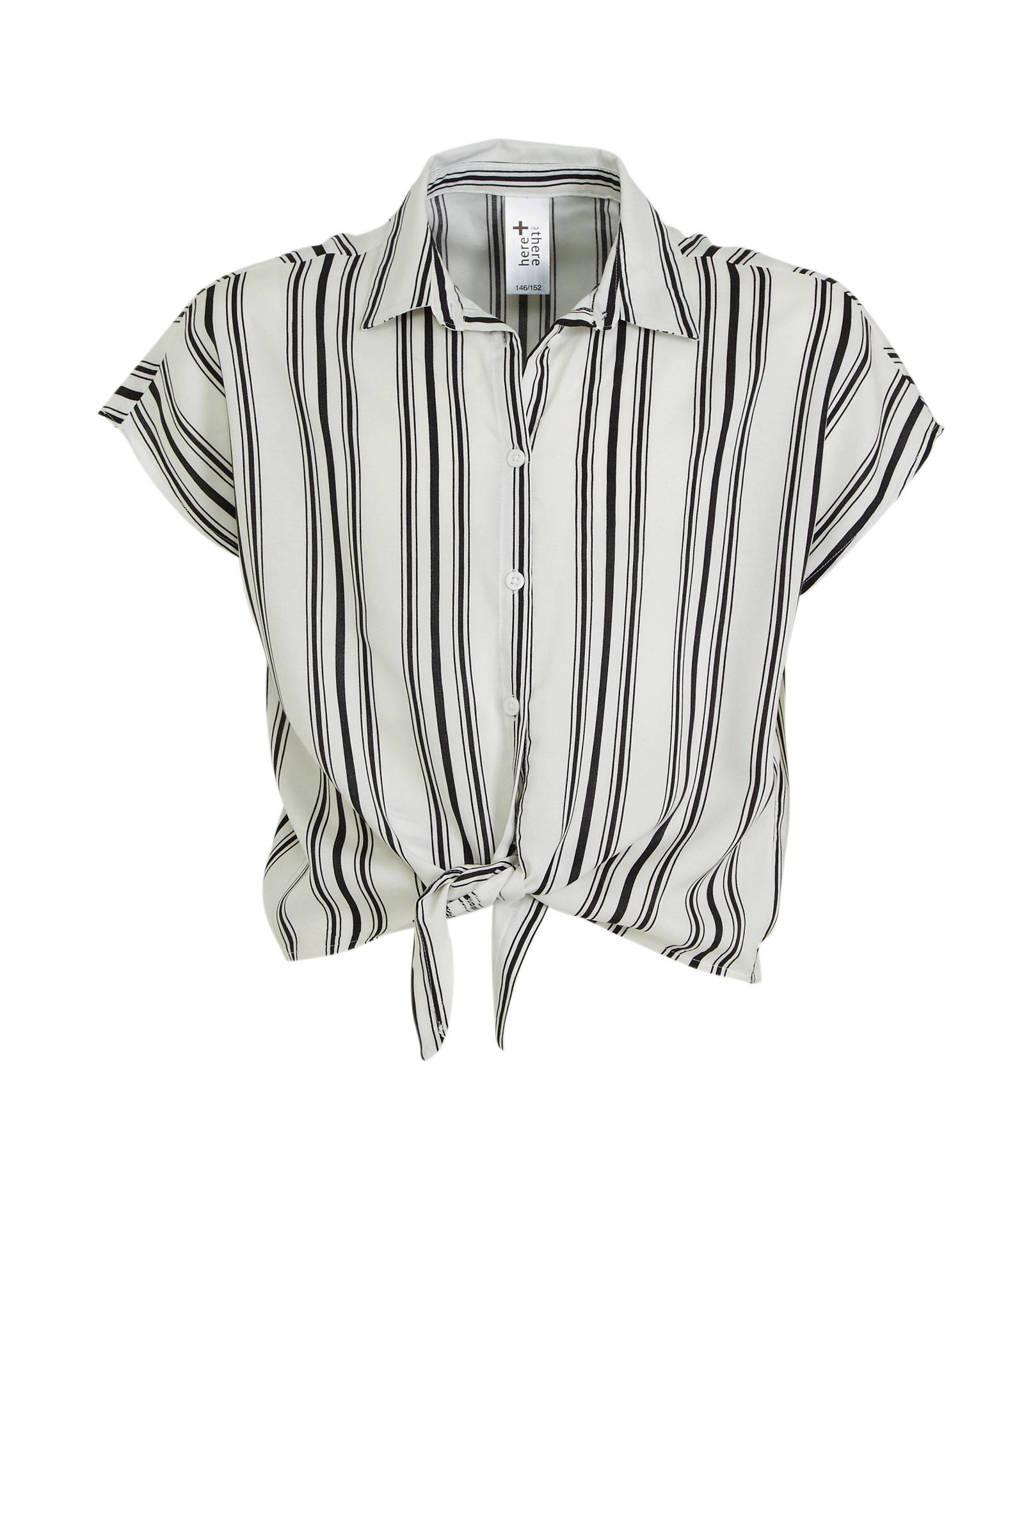 C&A Here & There gestreepte blouse wit/zwart, Wit/zwart